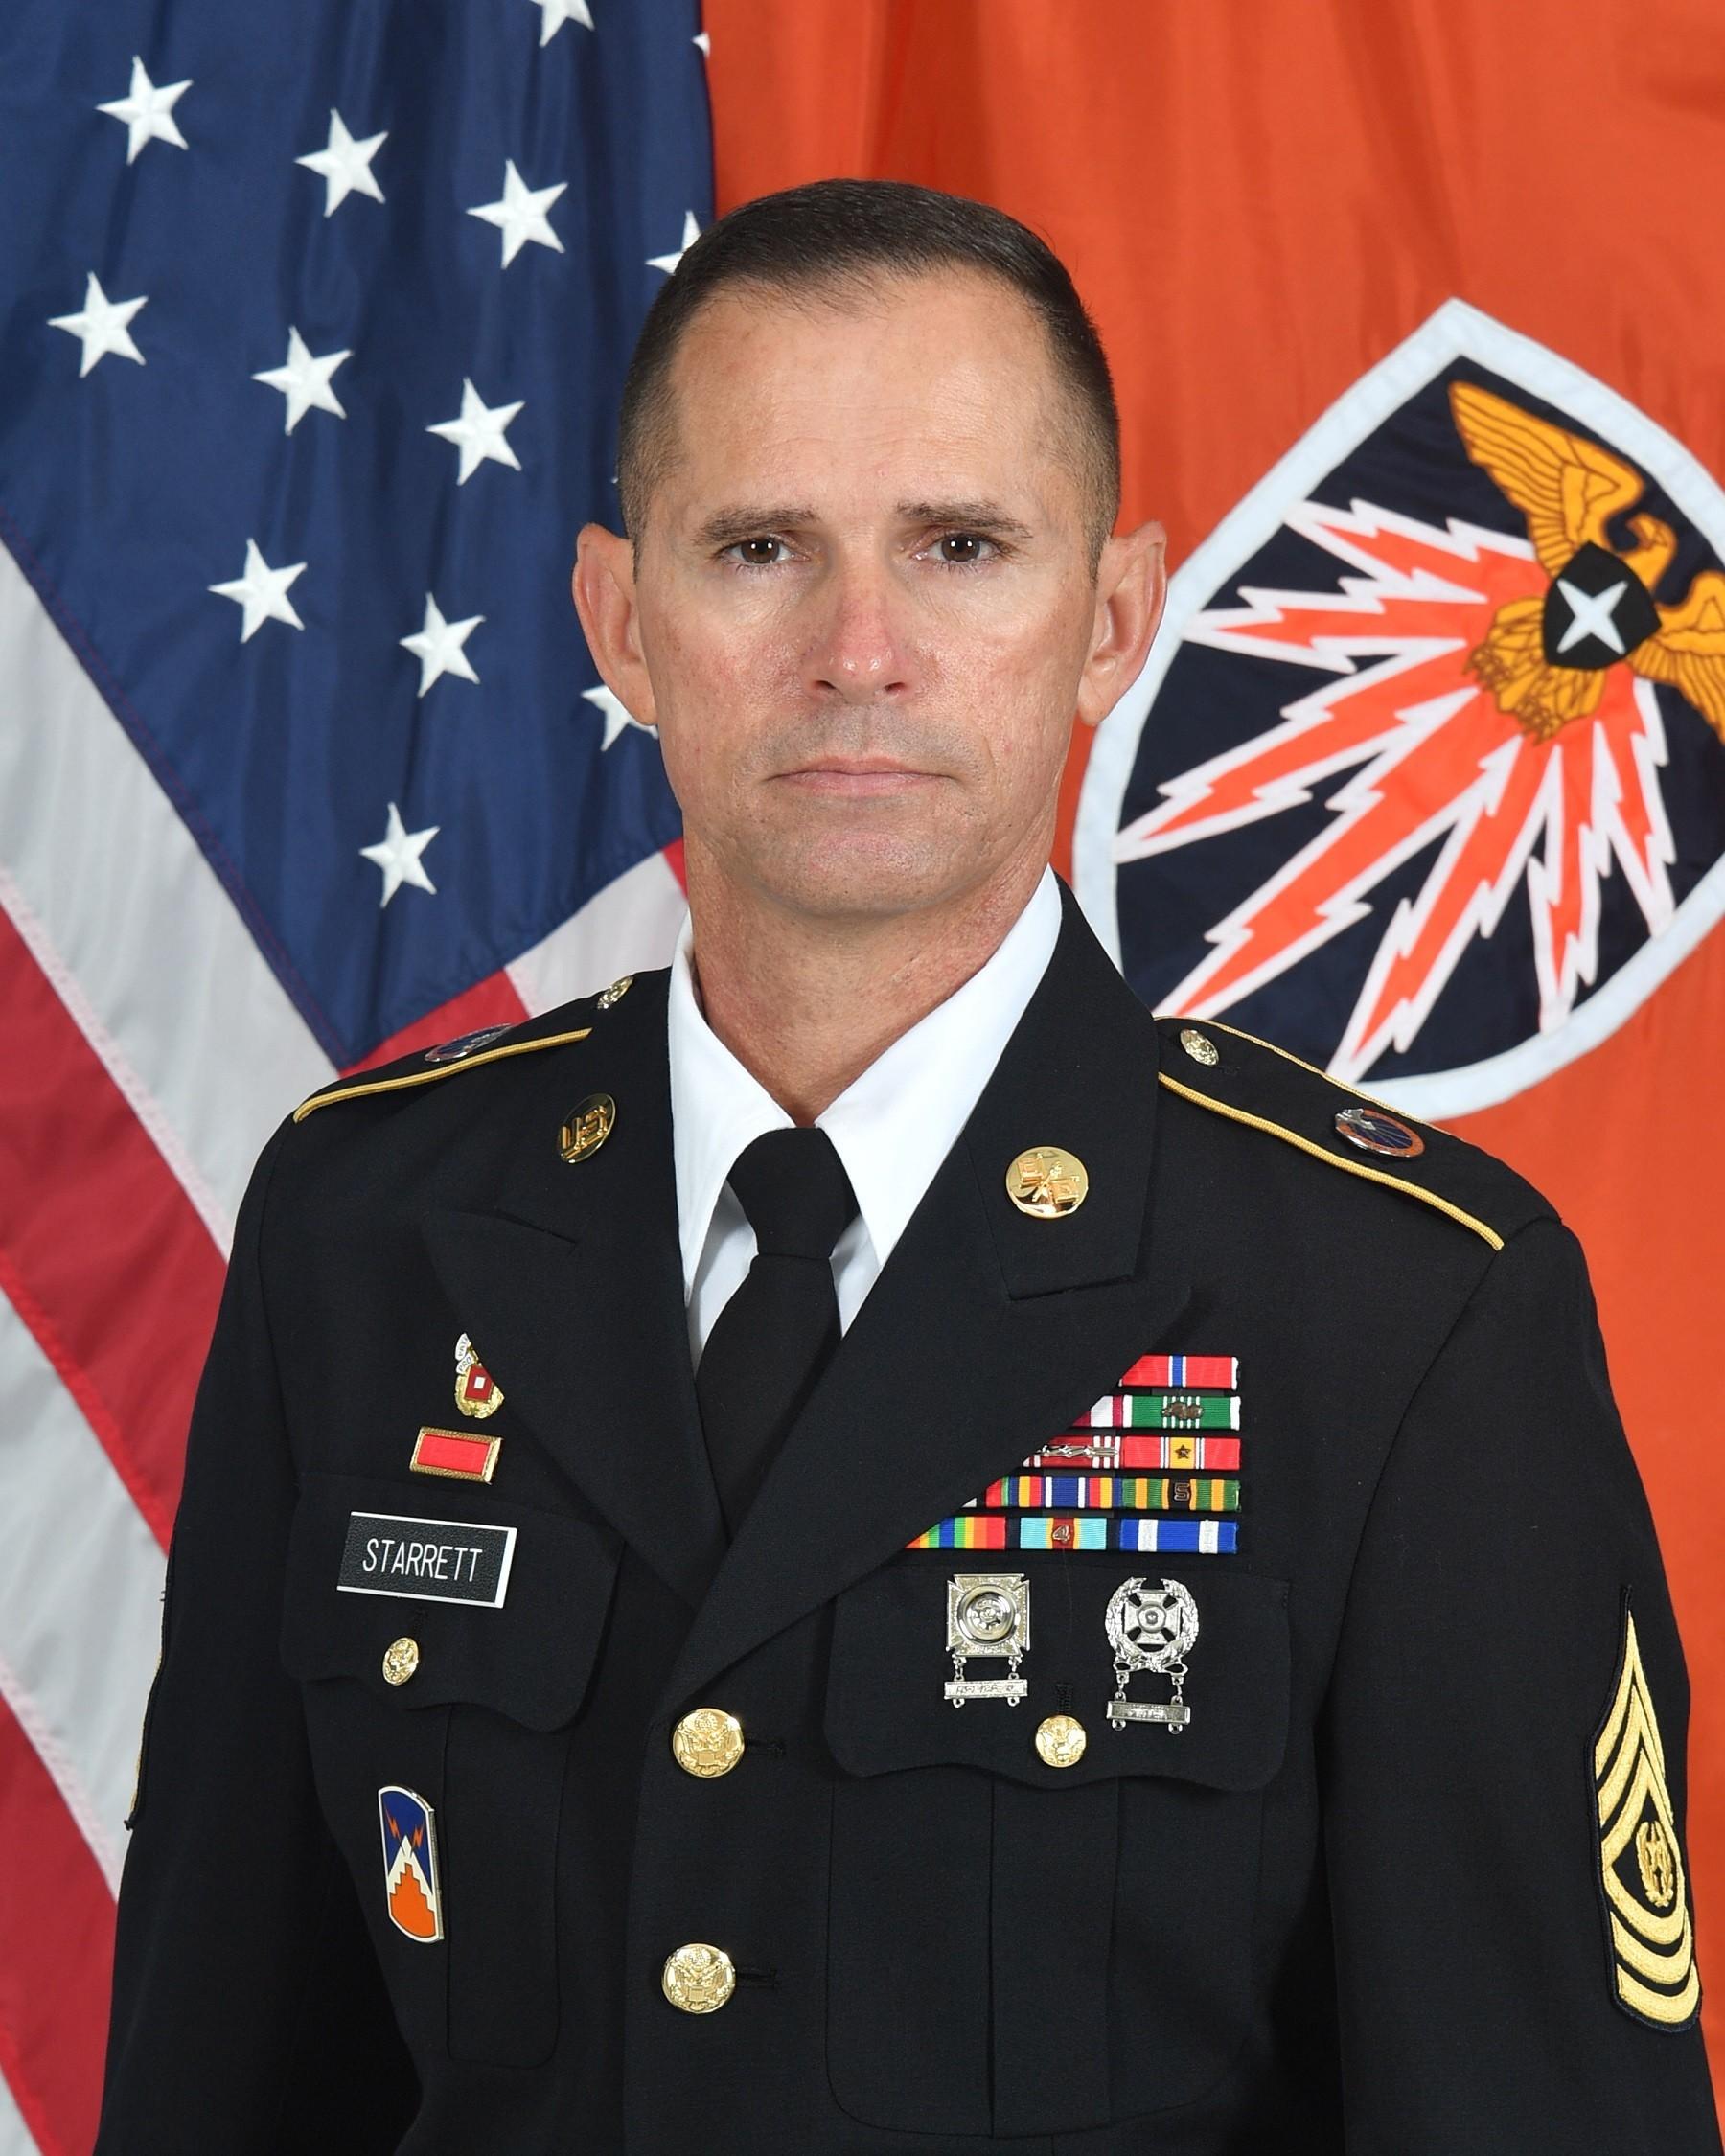 Command Sergeant Major Michael K. Starrett